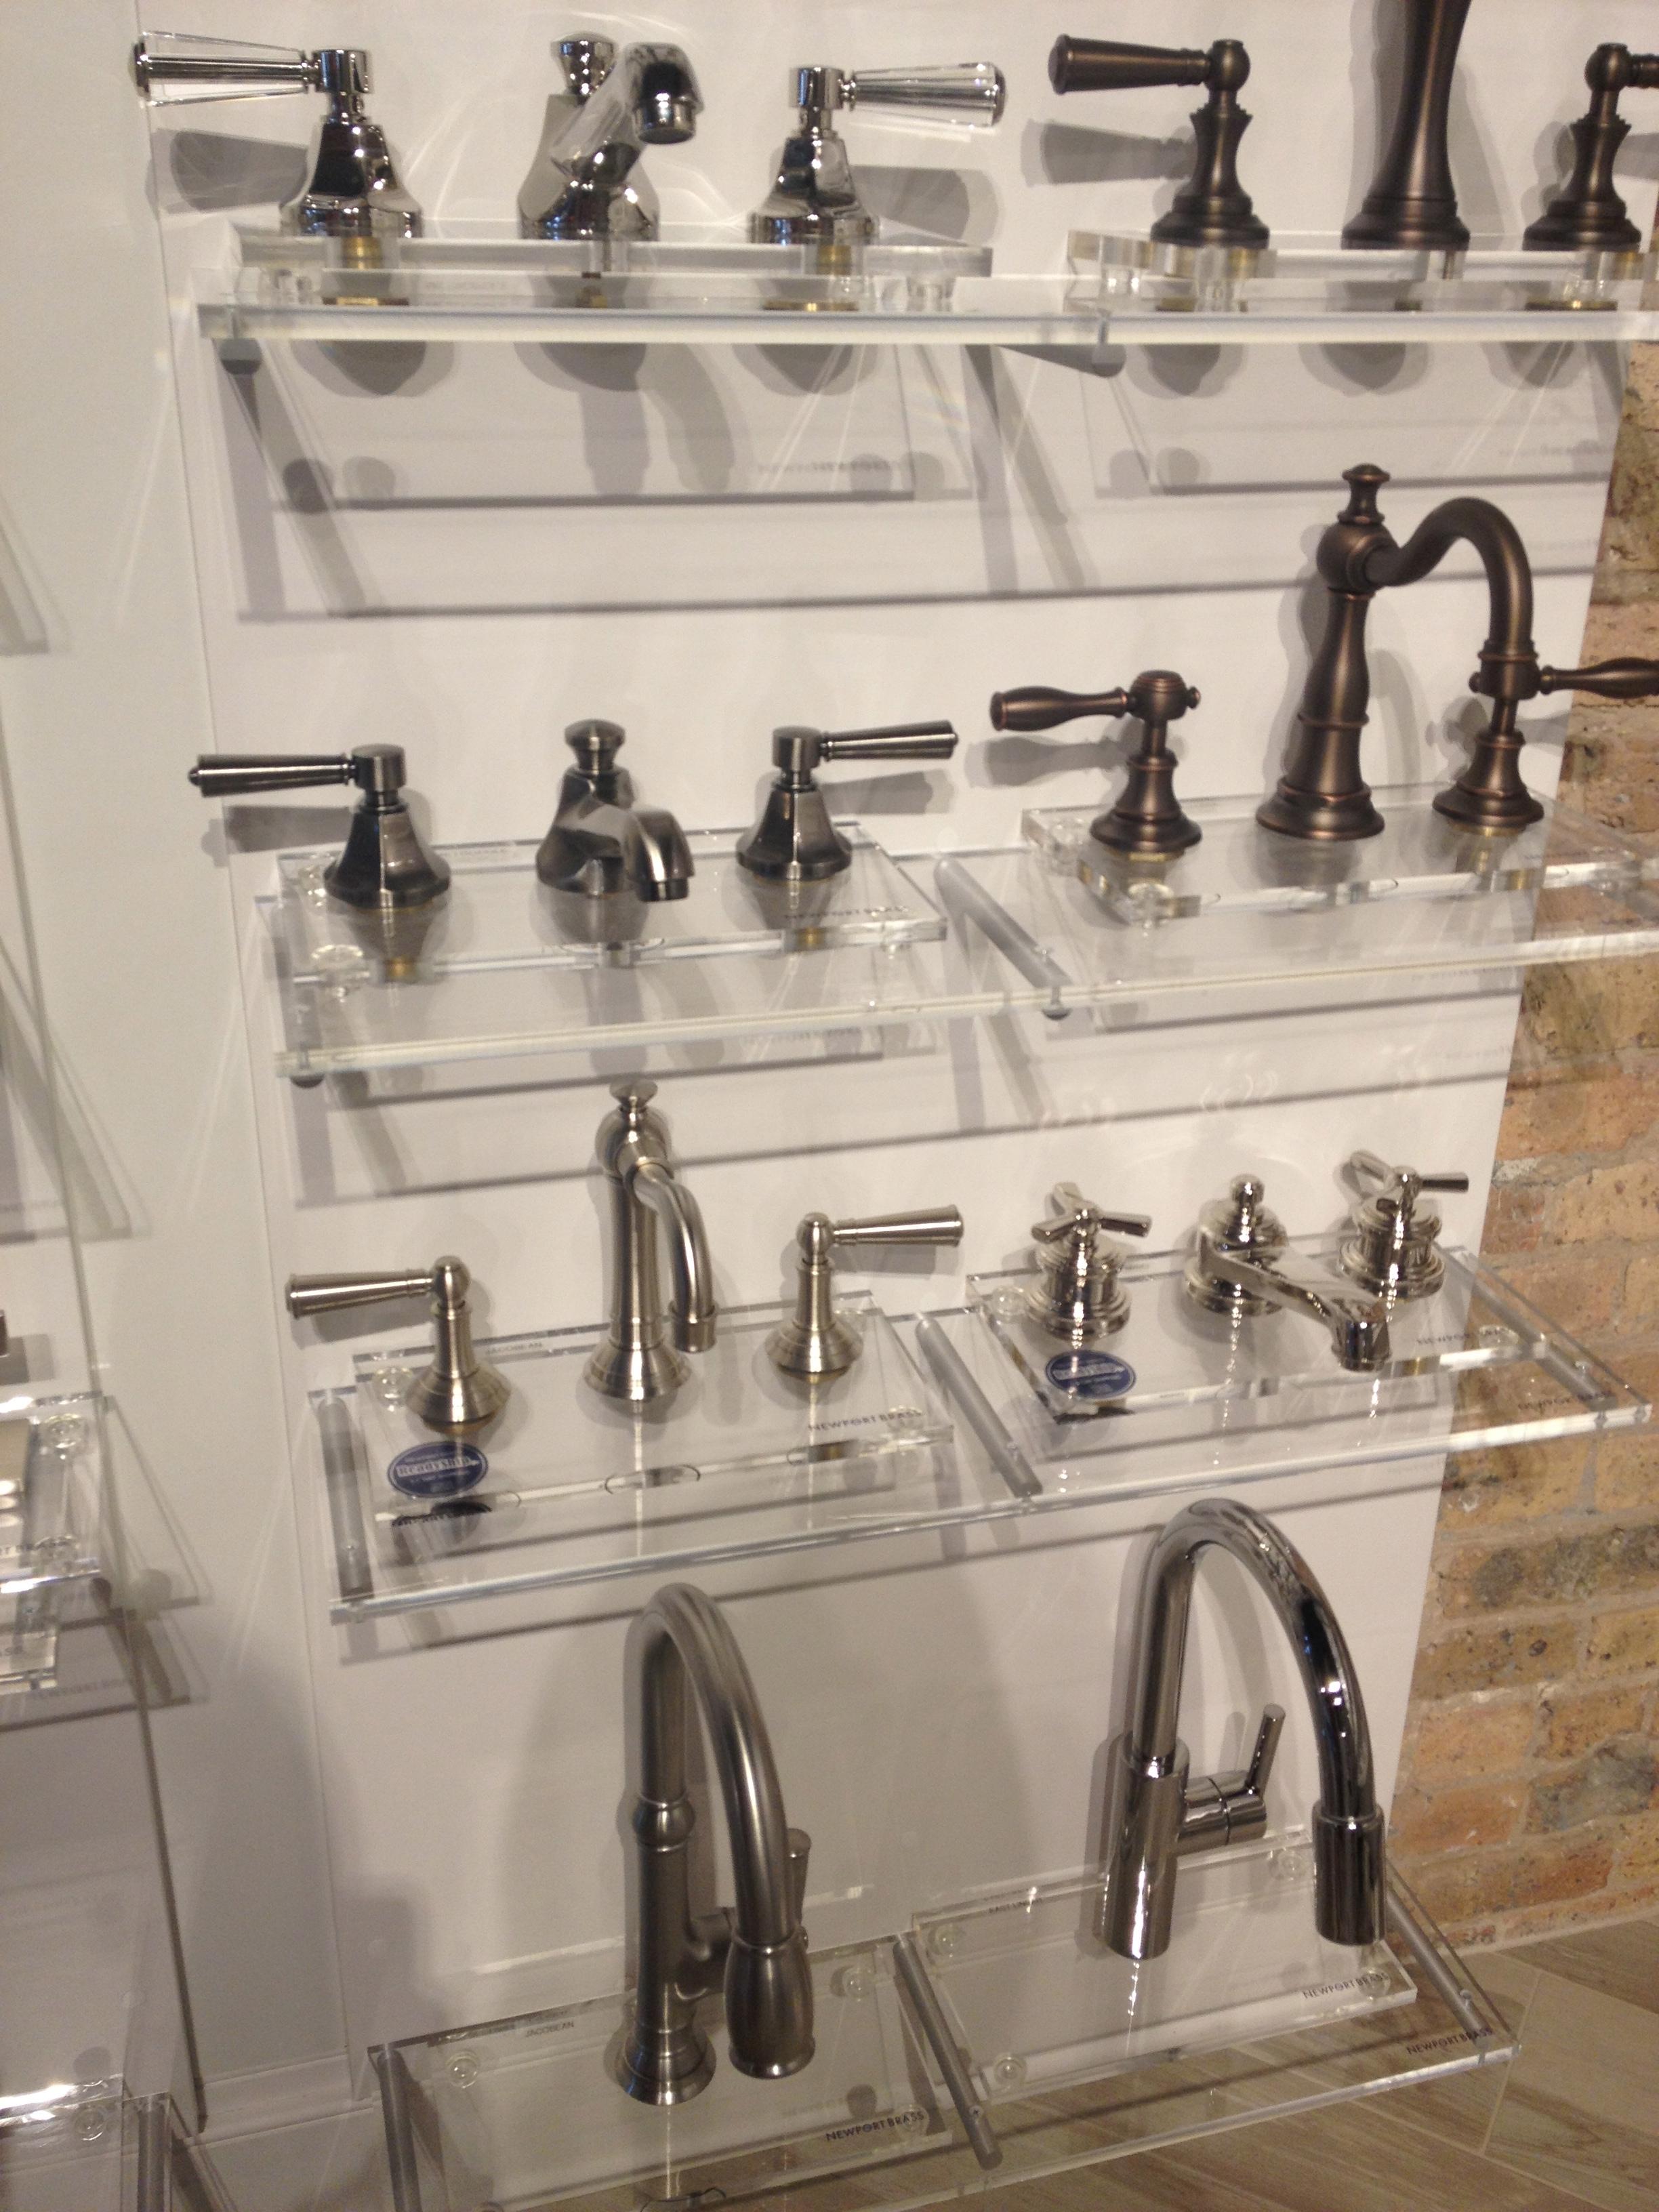 Chicago plumbing www.saranobledesigns.com